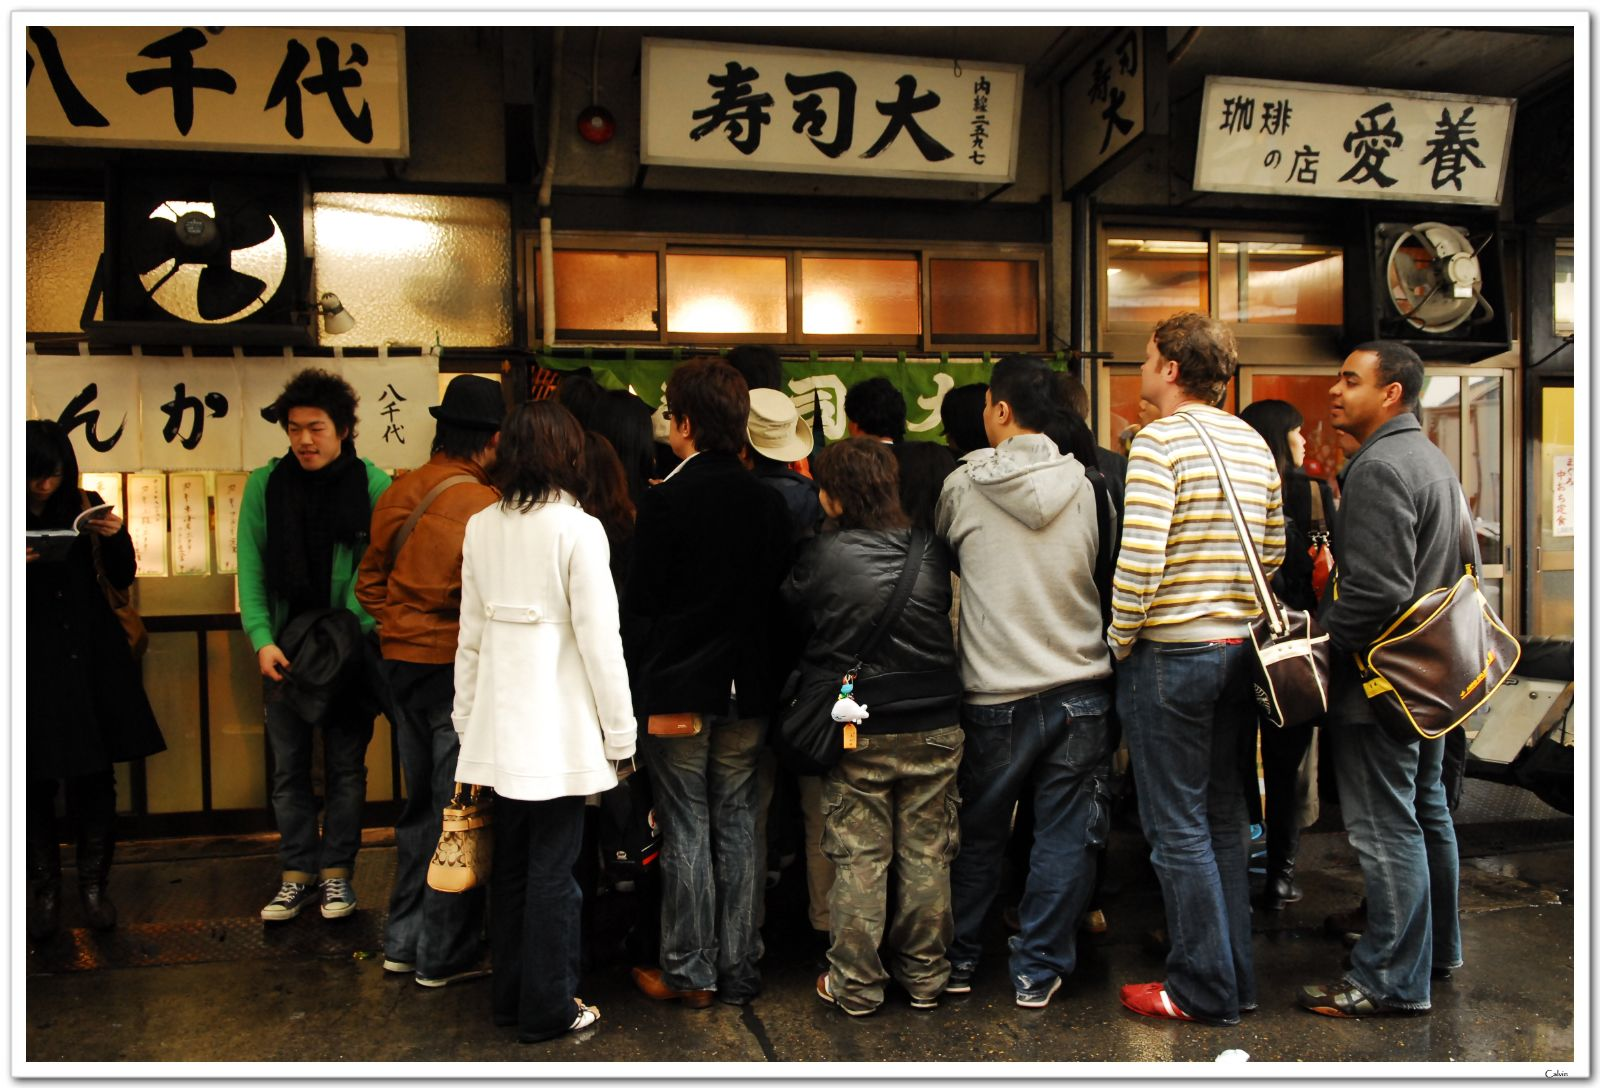 http://upload.wikimedia.org/wikipedia/commons/6/64/Sushi_restaurant_by_flyone_in_the_Tsukiji_Fish_Market,_Tokyo.jpg